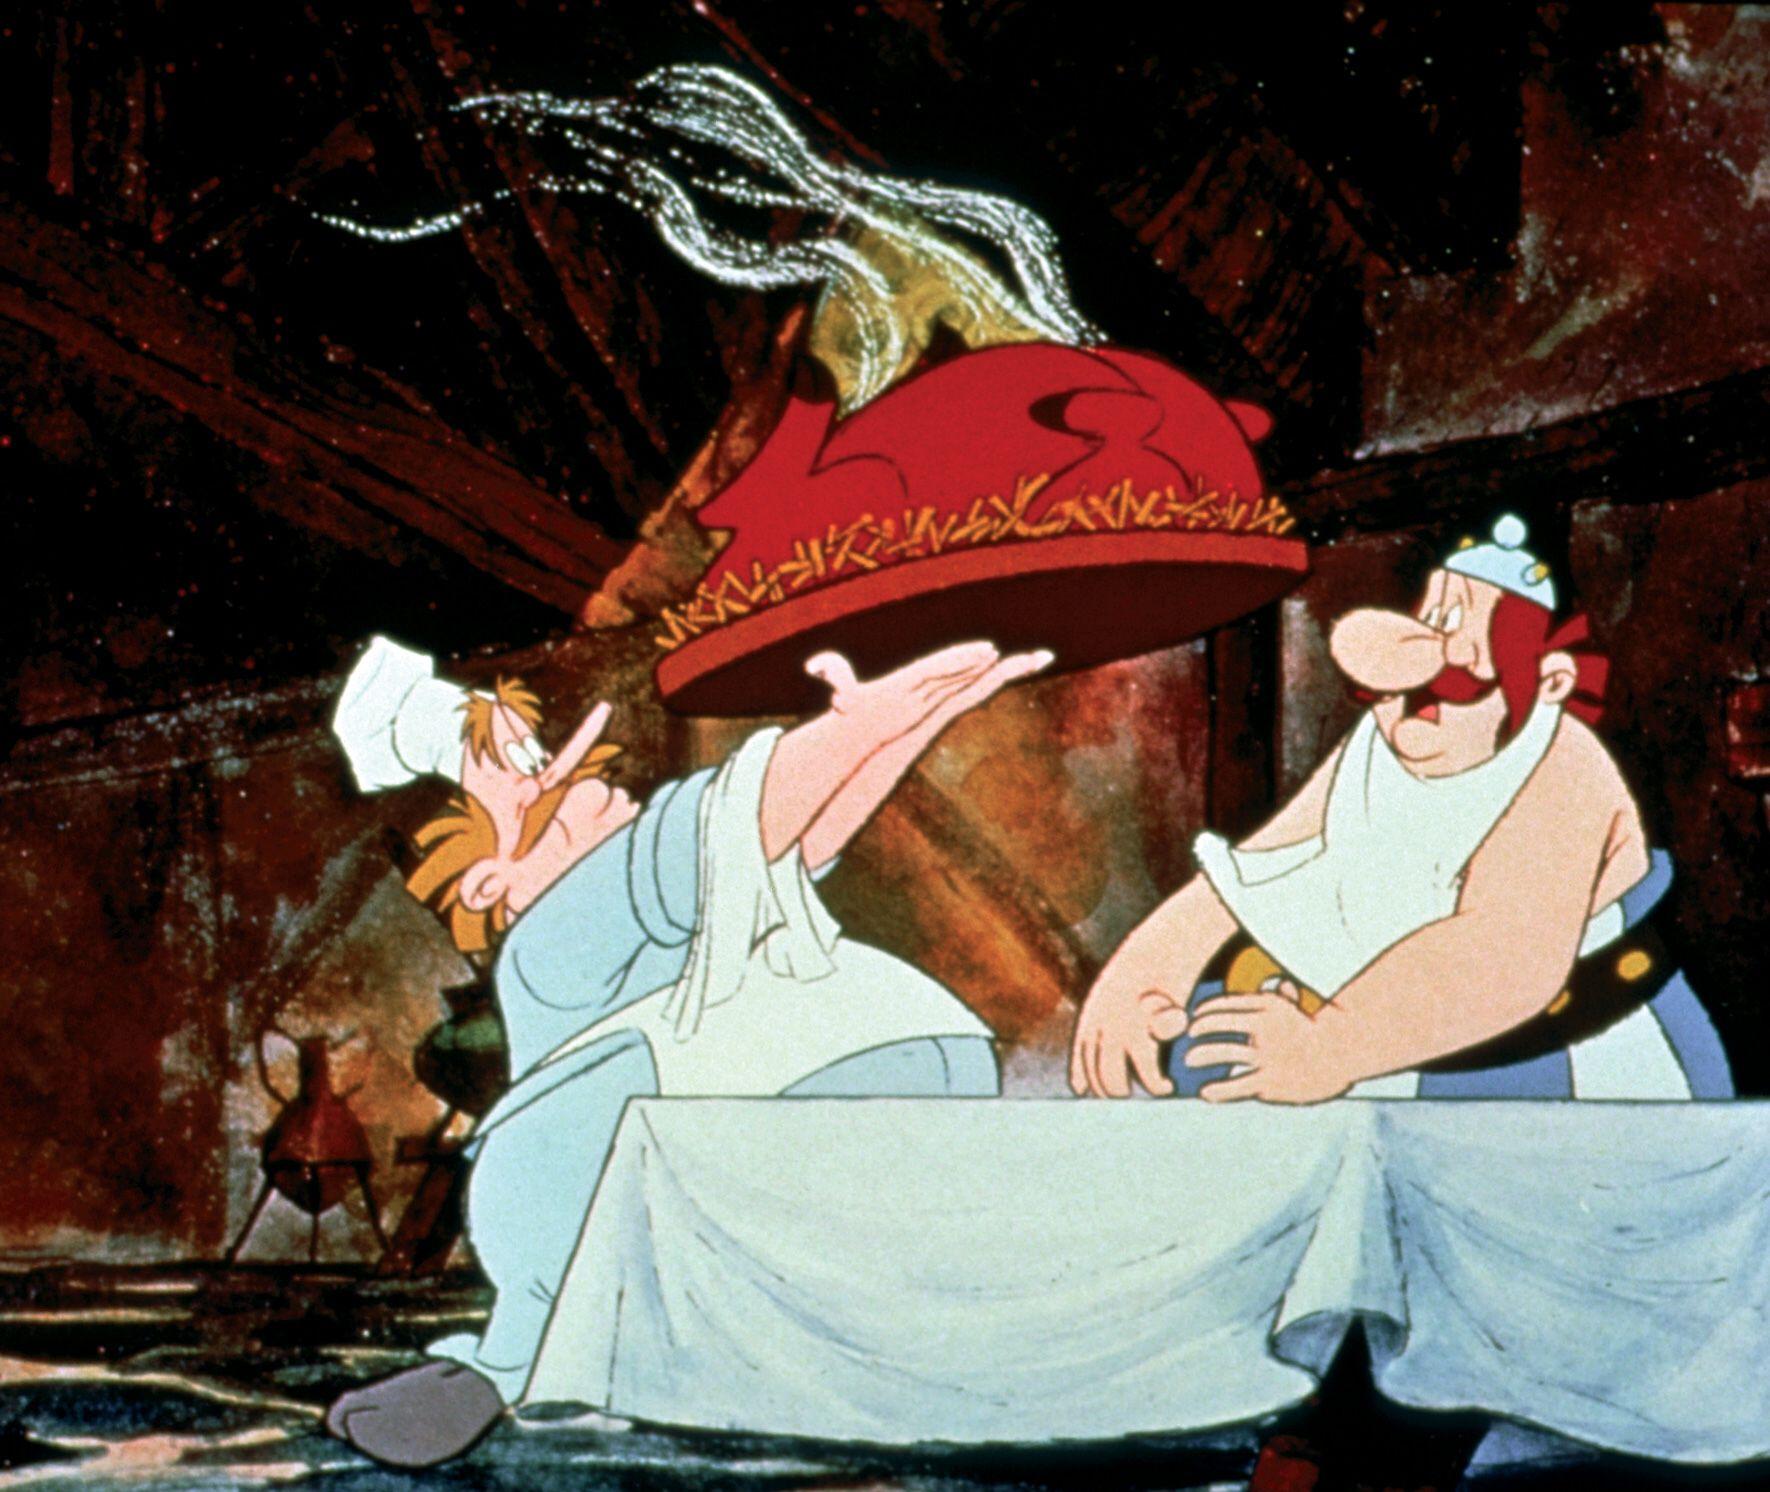 asterix erobert rom die spinnen die r mer die nacht. Black Bedroom Furniture Sets. Home Design Ideas